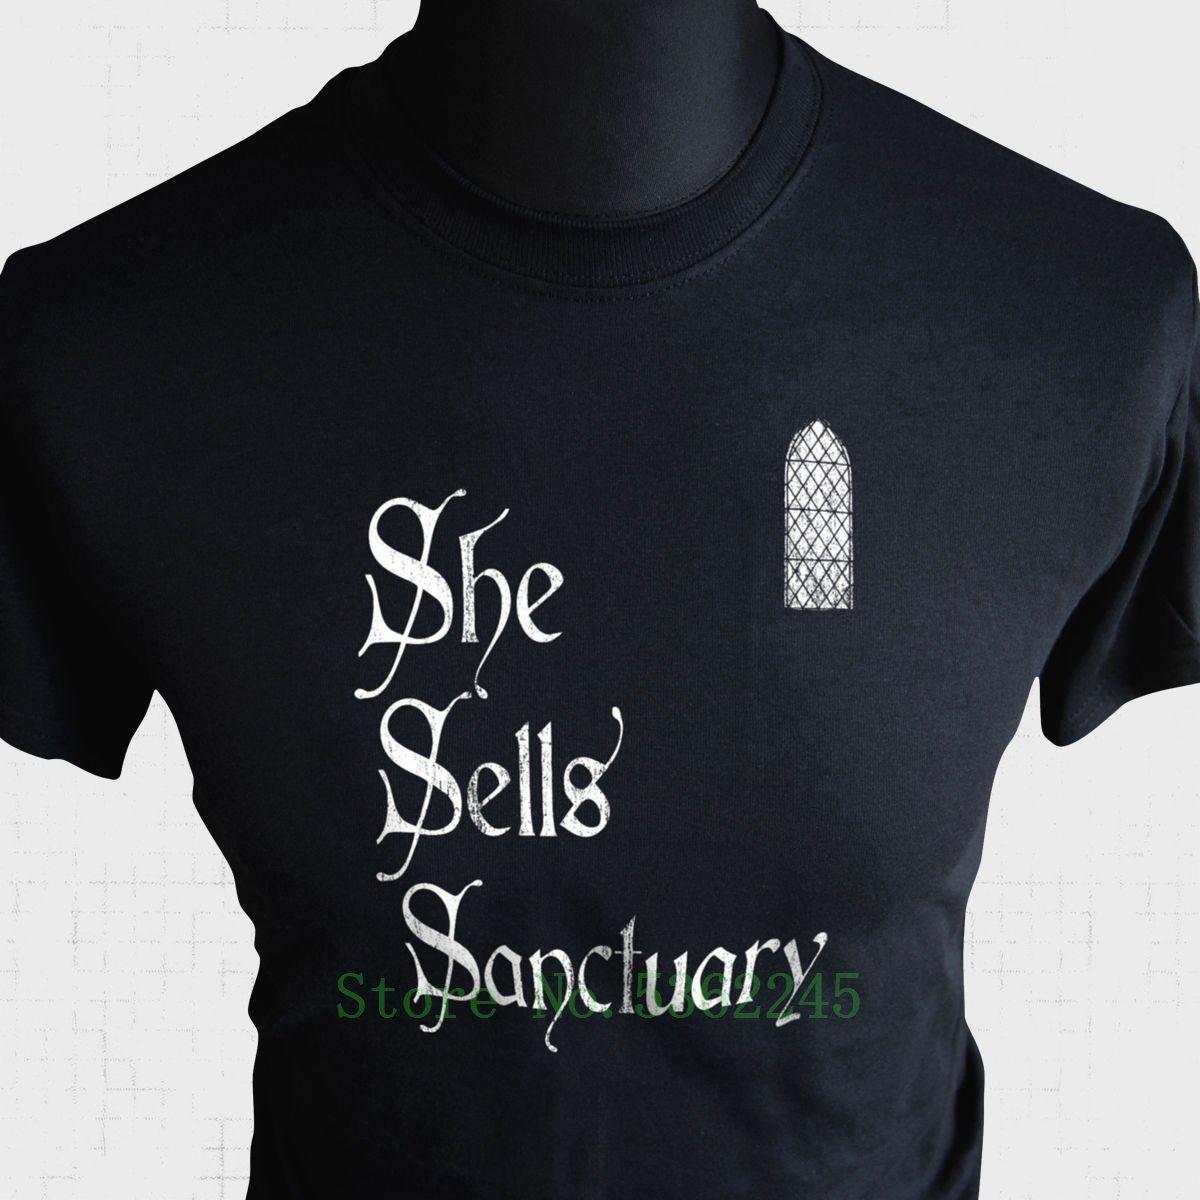 She Sells Sanctuary T Shirt The Cult Amor Retro Music Banda Tributo T 1985 Camiseta 5XL Mens T Shirt Print Homens T-shirt da aptidão